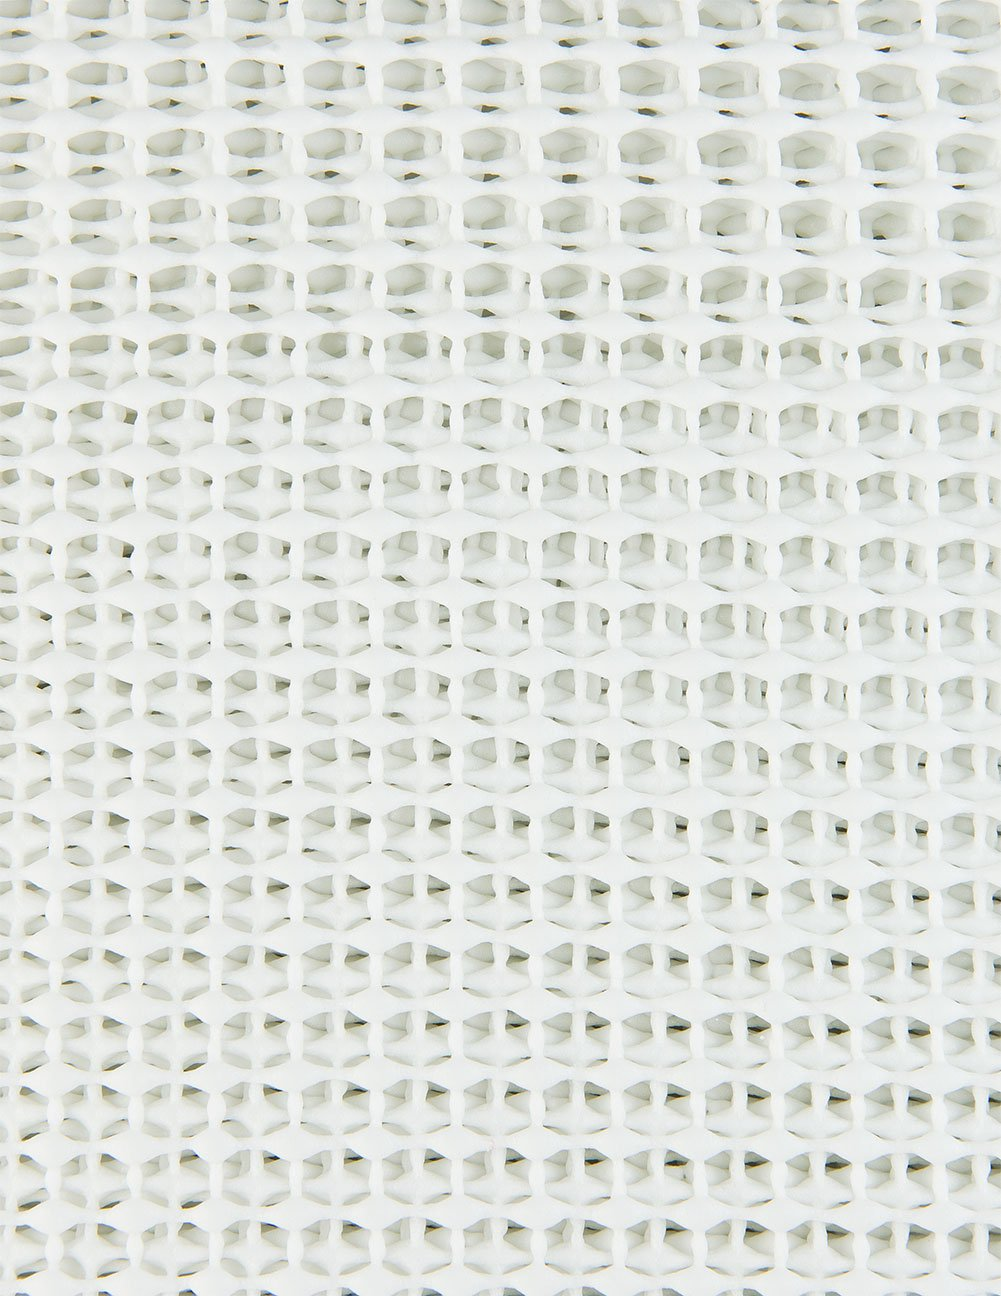 AX-AY-ABHI-23065 Cleverbrand 1400 Series Non-Slip Pad White 2 X 8 Cleverbrand Inc